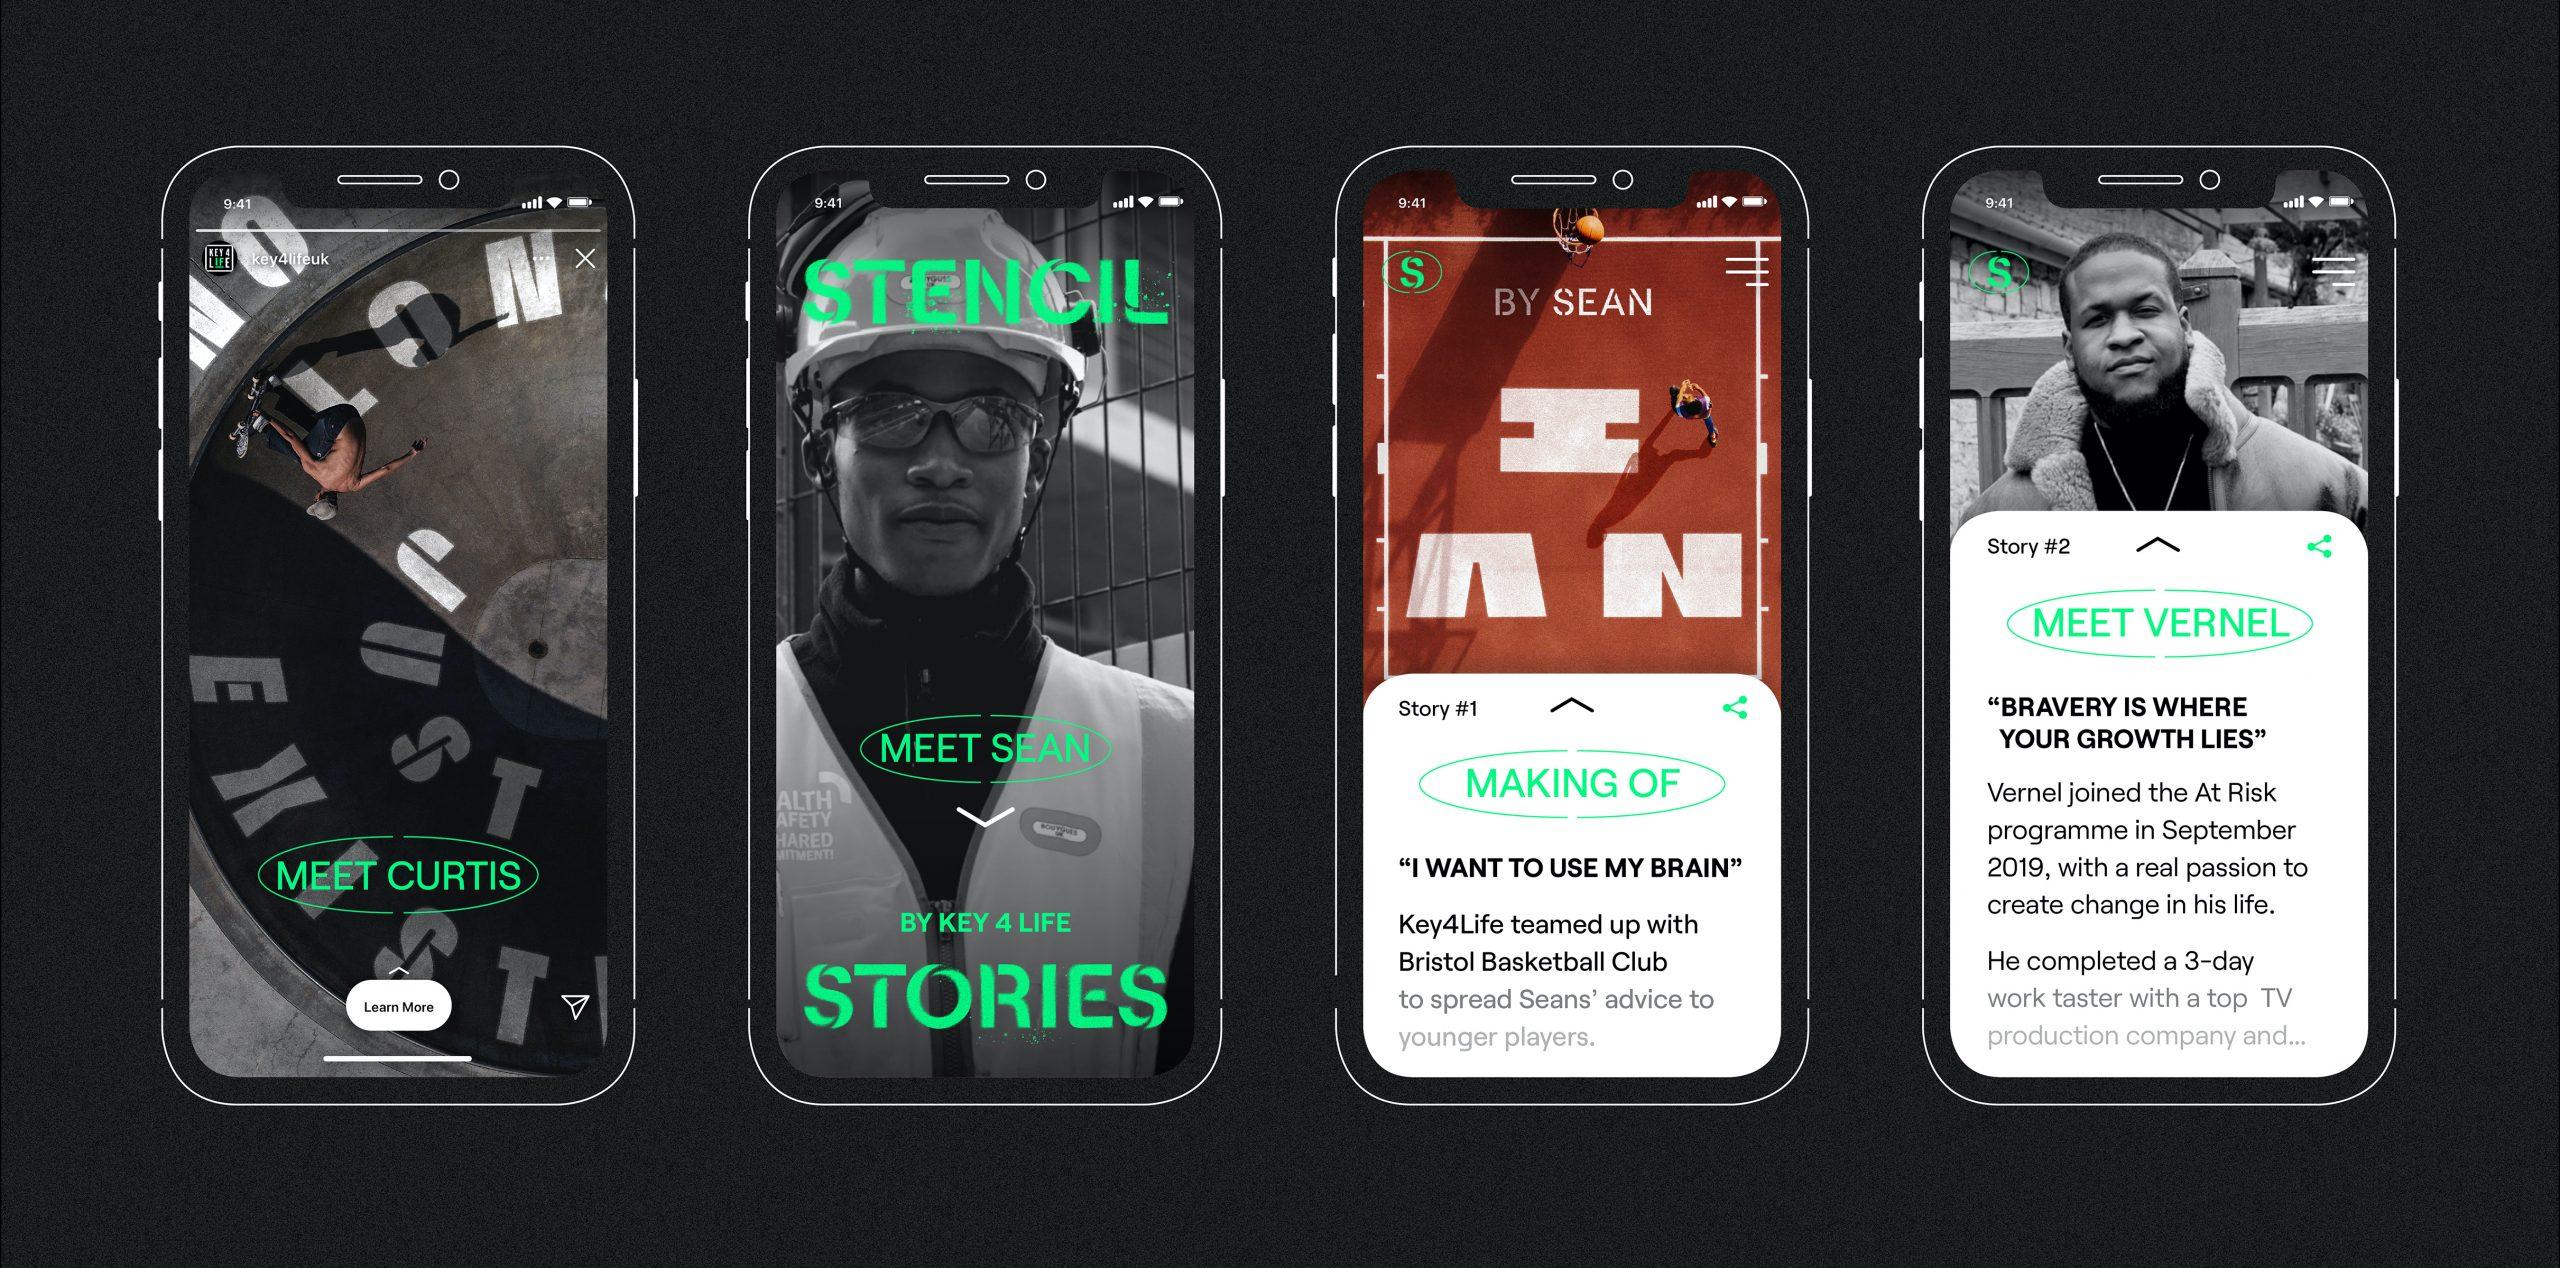 stencil-stories-digital